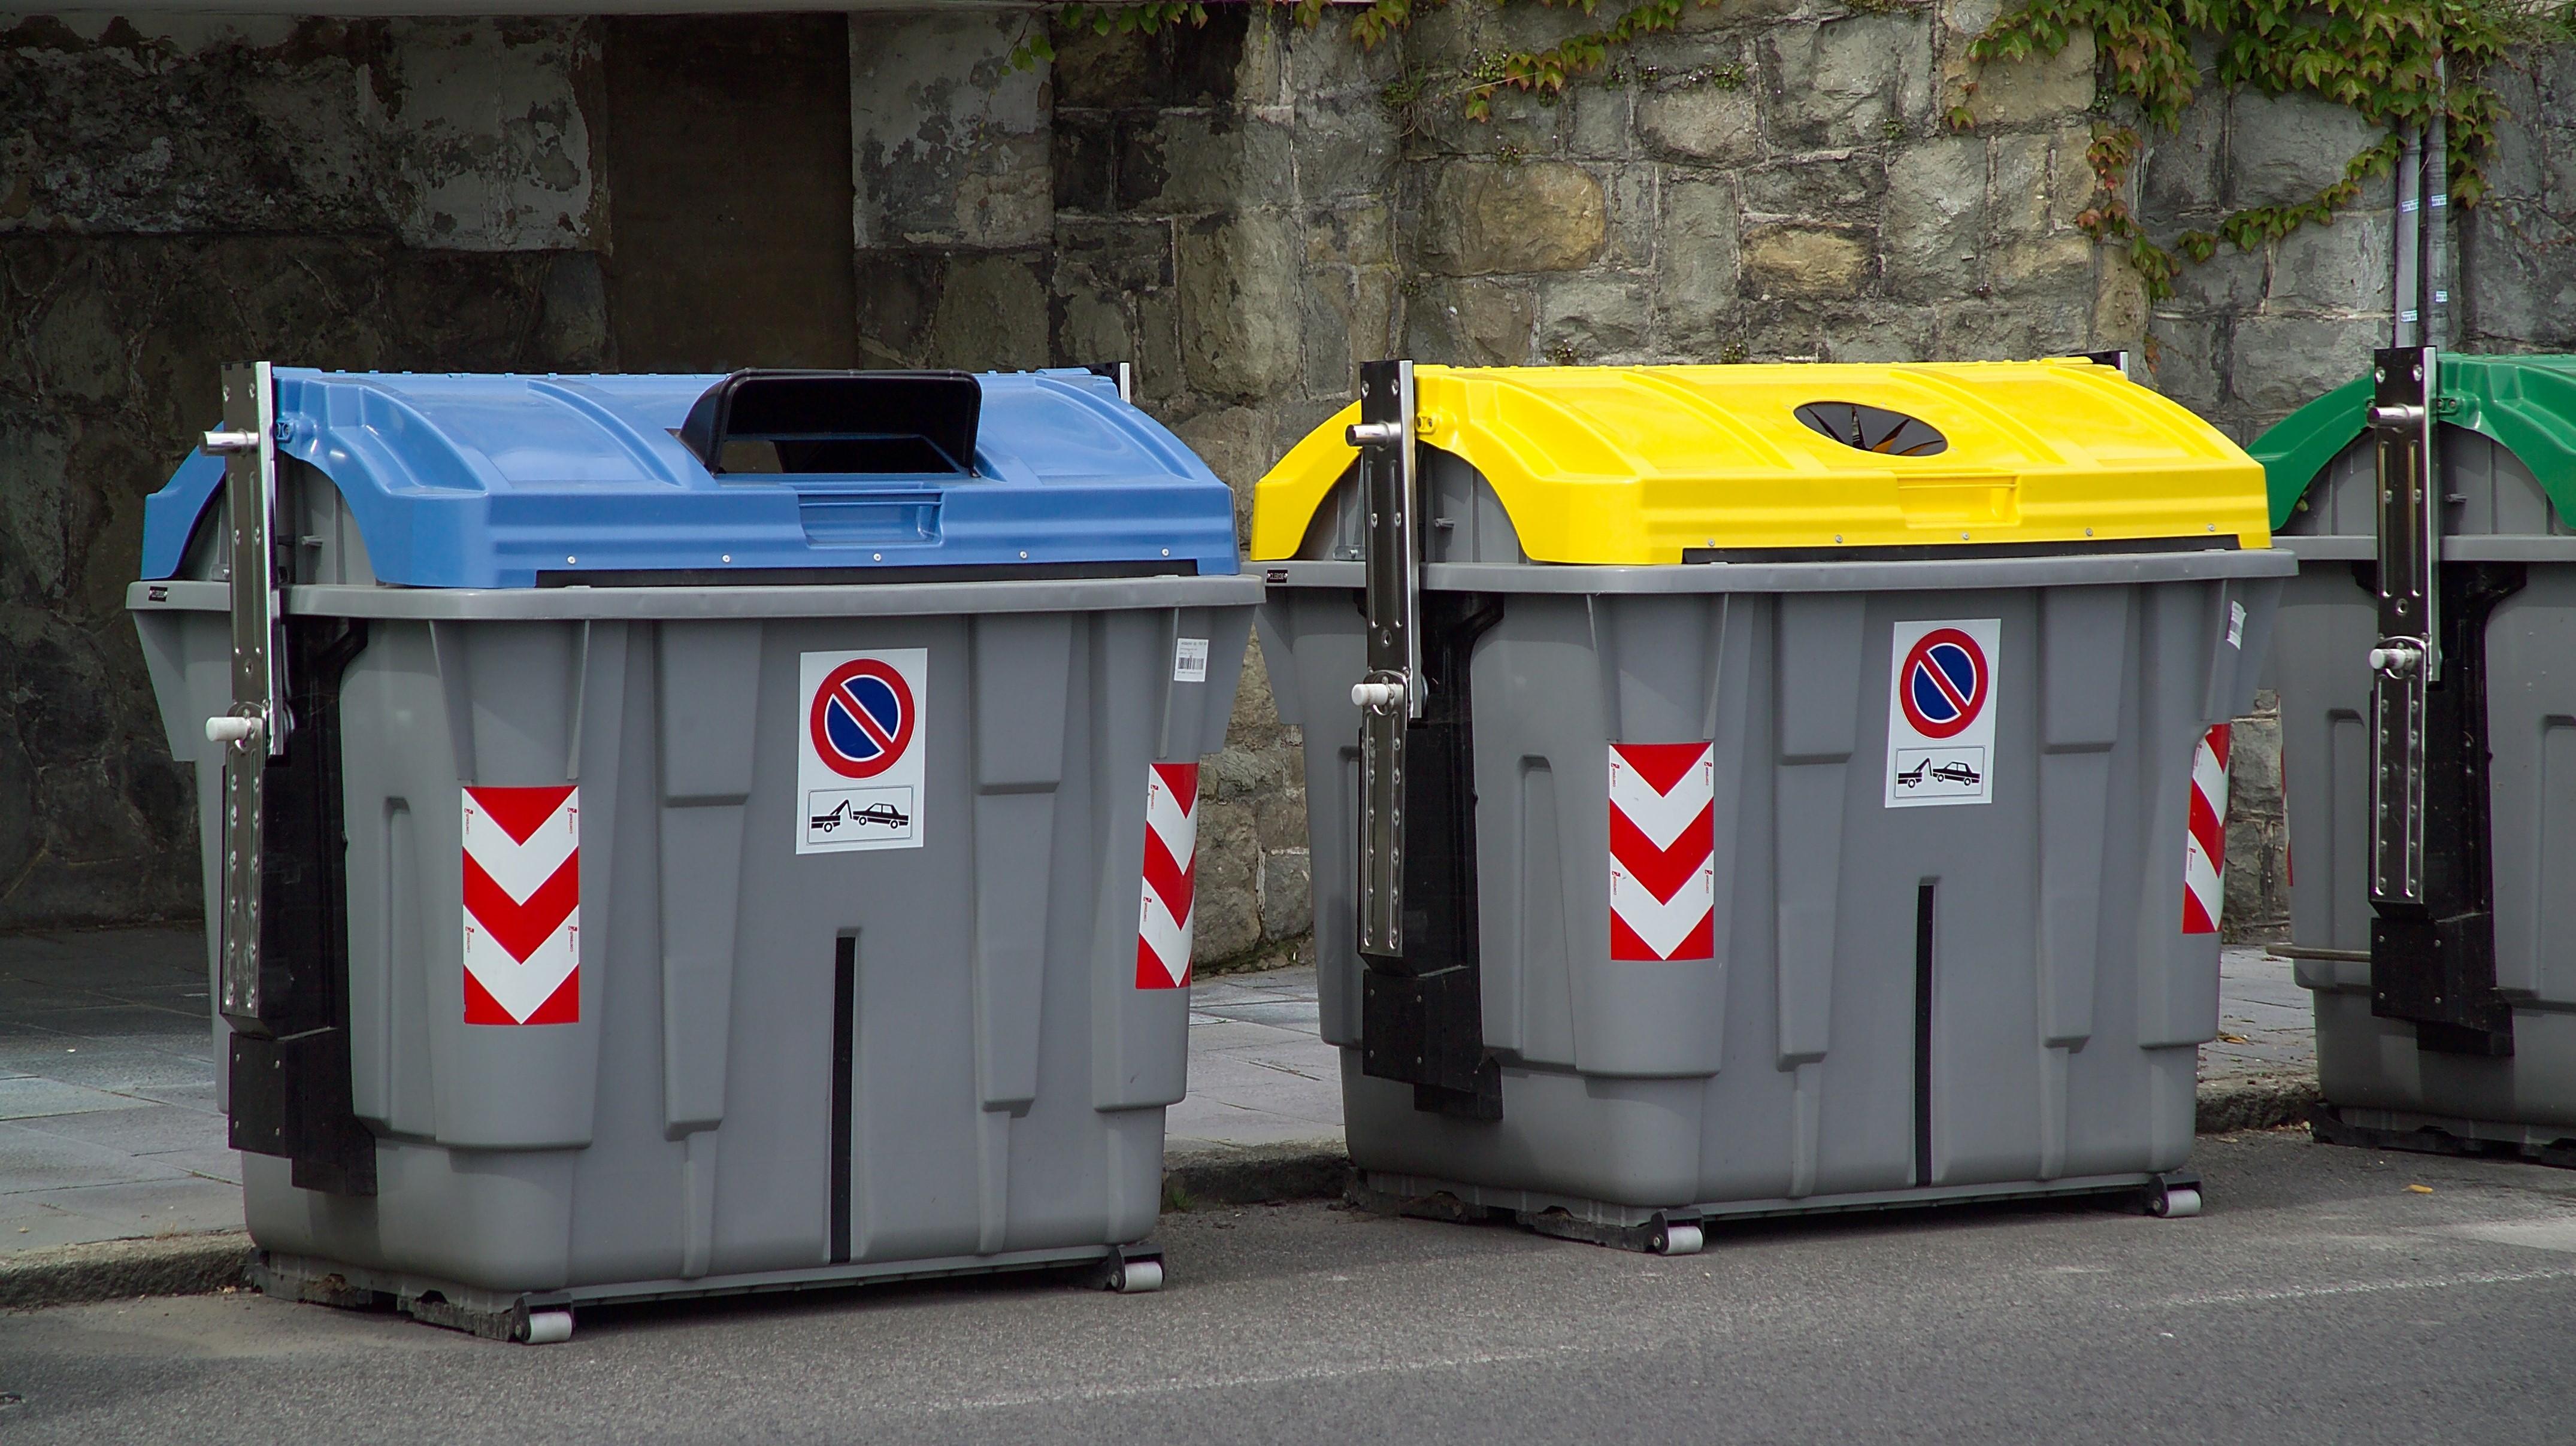 Irekia eusko jaurlaritza gobierno vasco gobierno - Contenedores de reciclar ...